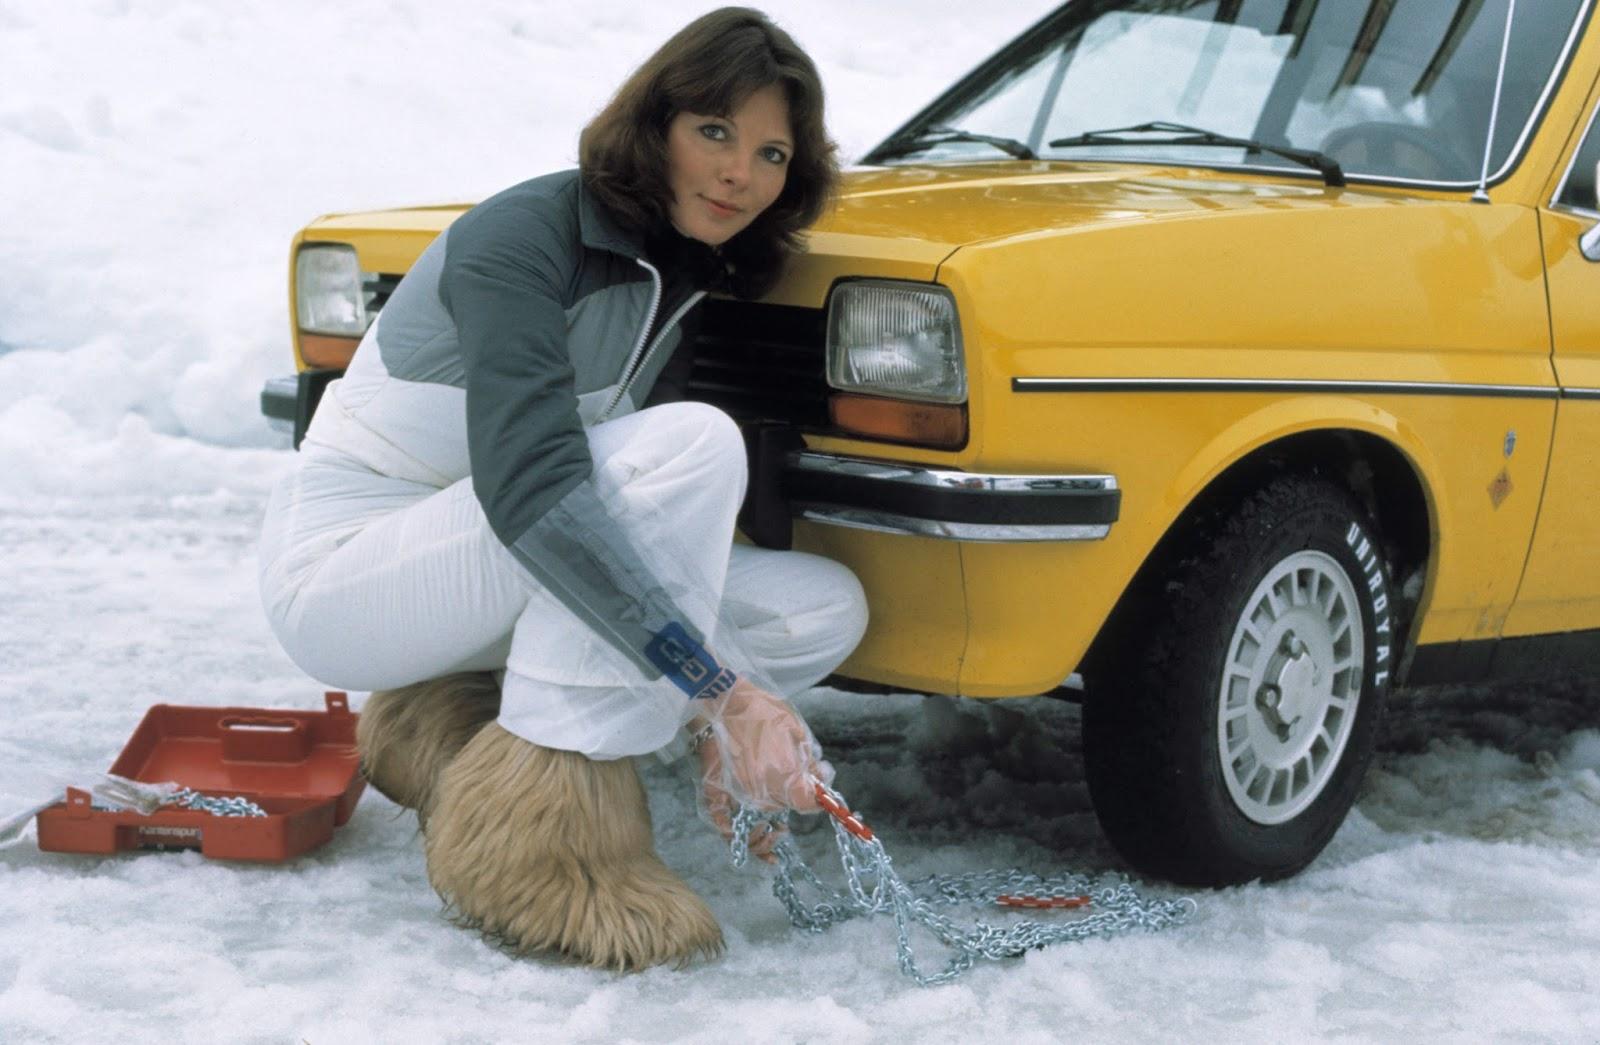 FordFiesta 1976 1983 Fiesta Ghia Winter 02 2 Έκανες Πολύ Δρόμο Μωρό μου! - Το Ford Fiesta Γίνεται 40 Ετών Ford, Ford Fiesta, Fun, videos, zblog